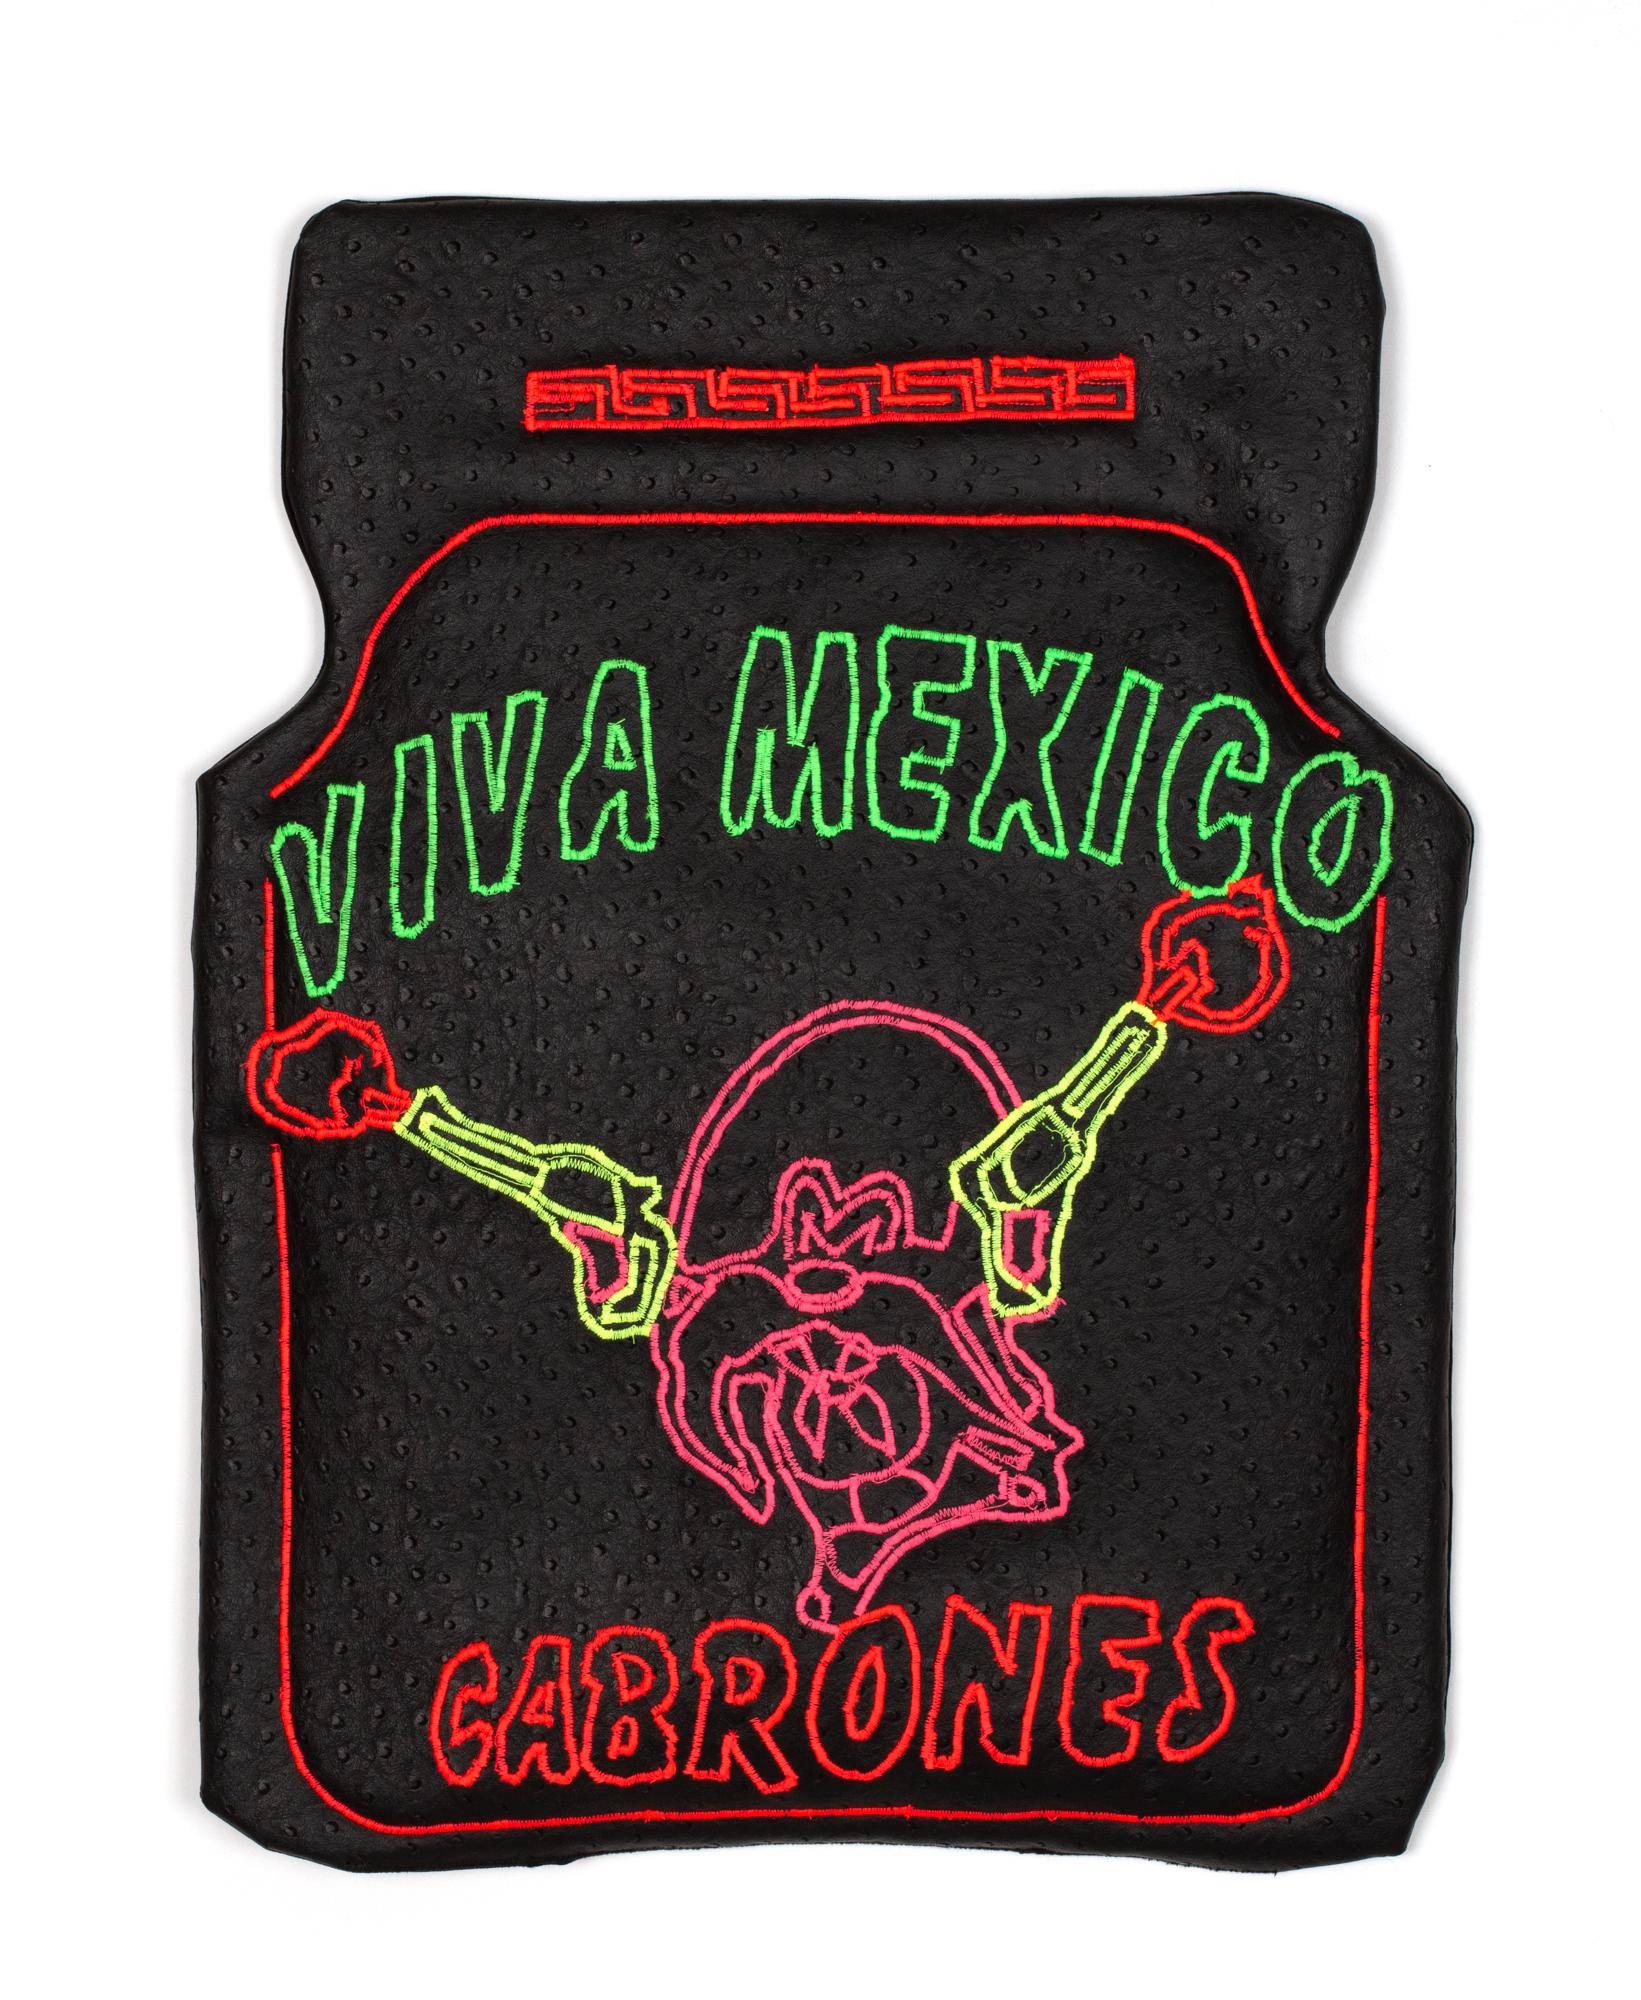 Viva (Truck Floor Mat), 2019  faux ostrich leather, cotton fabric, polyurethane foam, thread, hardware  17 x 23 inches